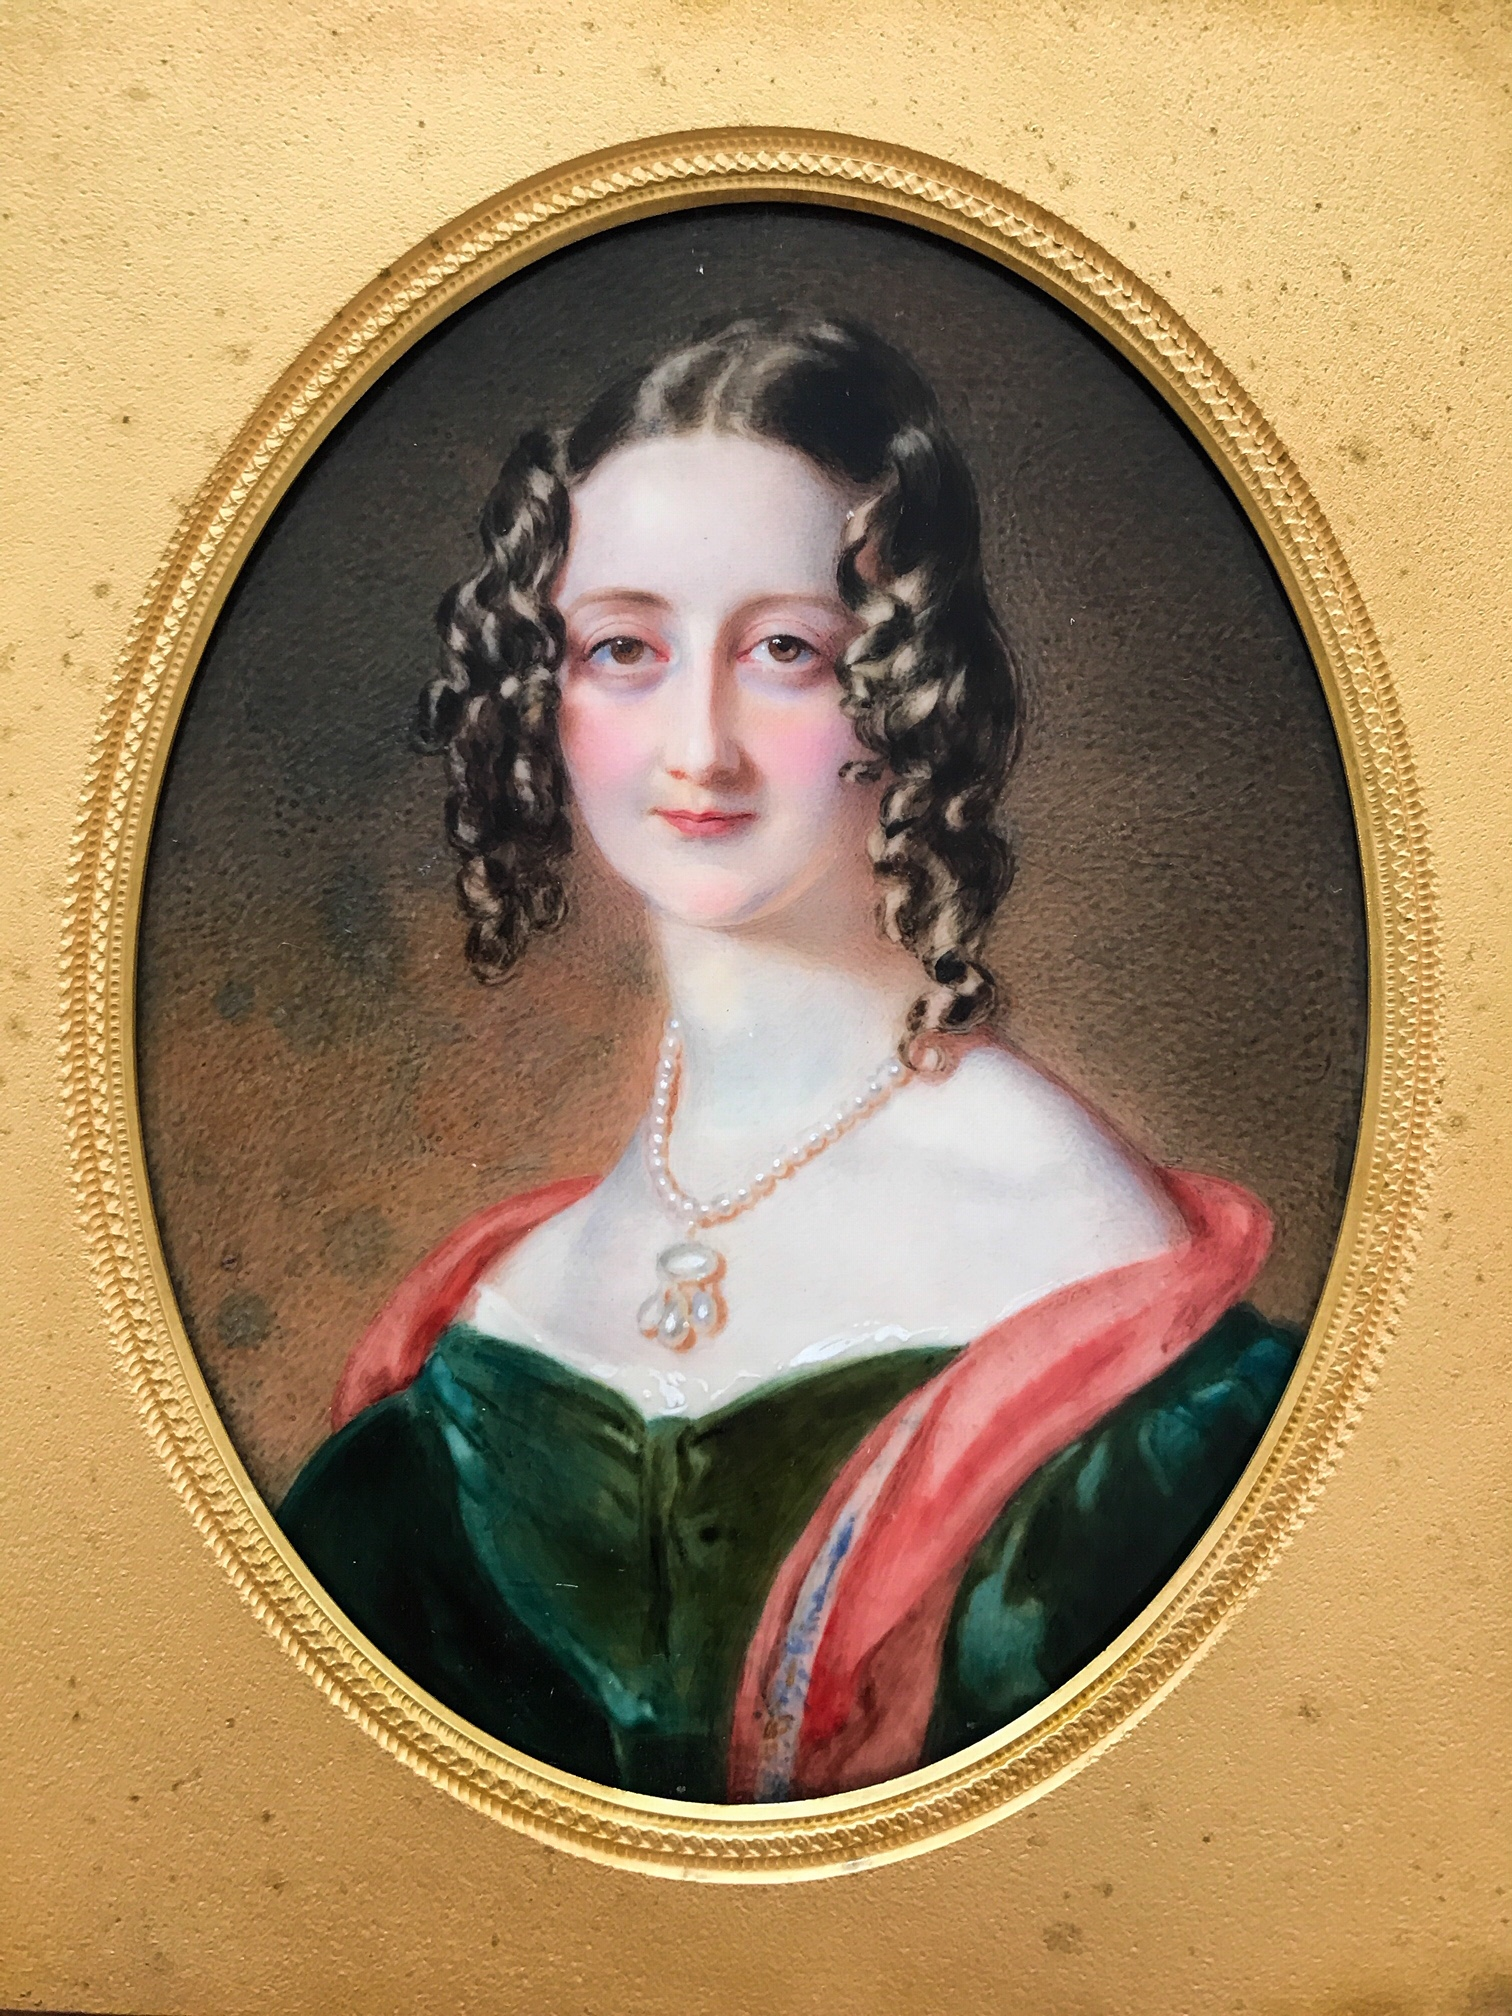 Lady George Hill 1st, Cassandra Jane Knight.  Credit: Karen Ievers.